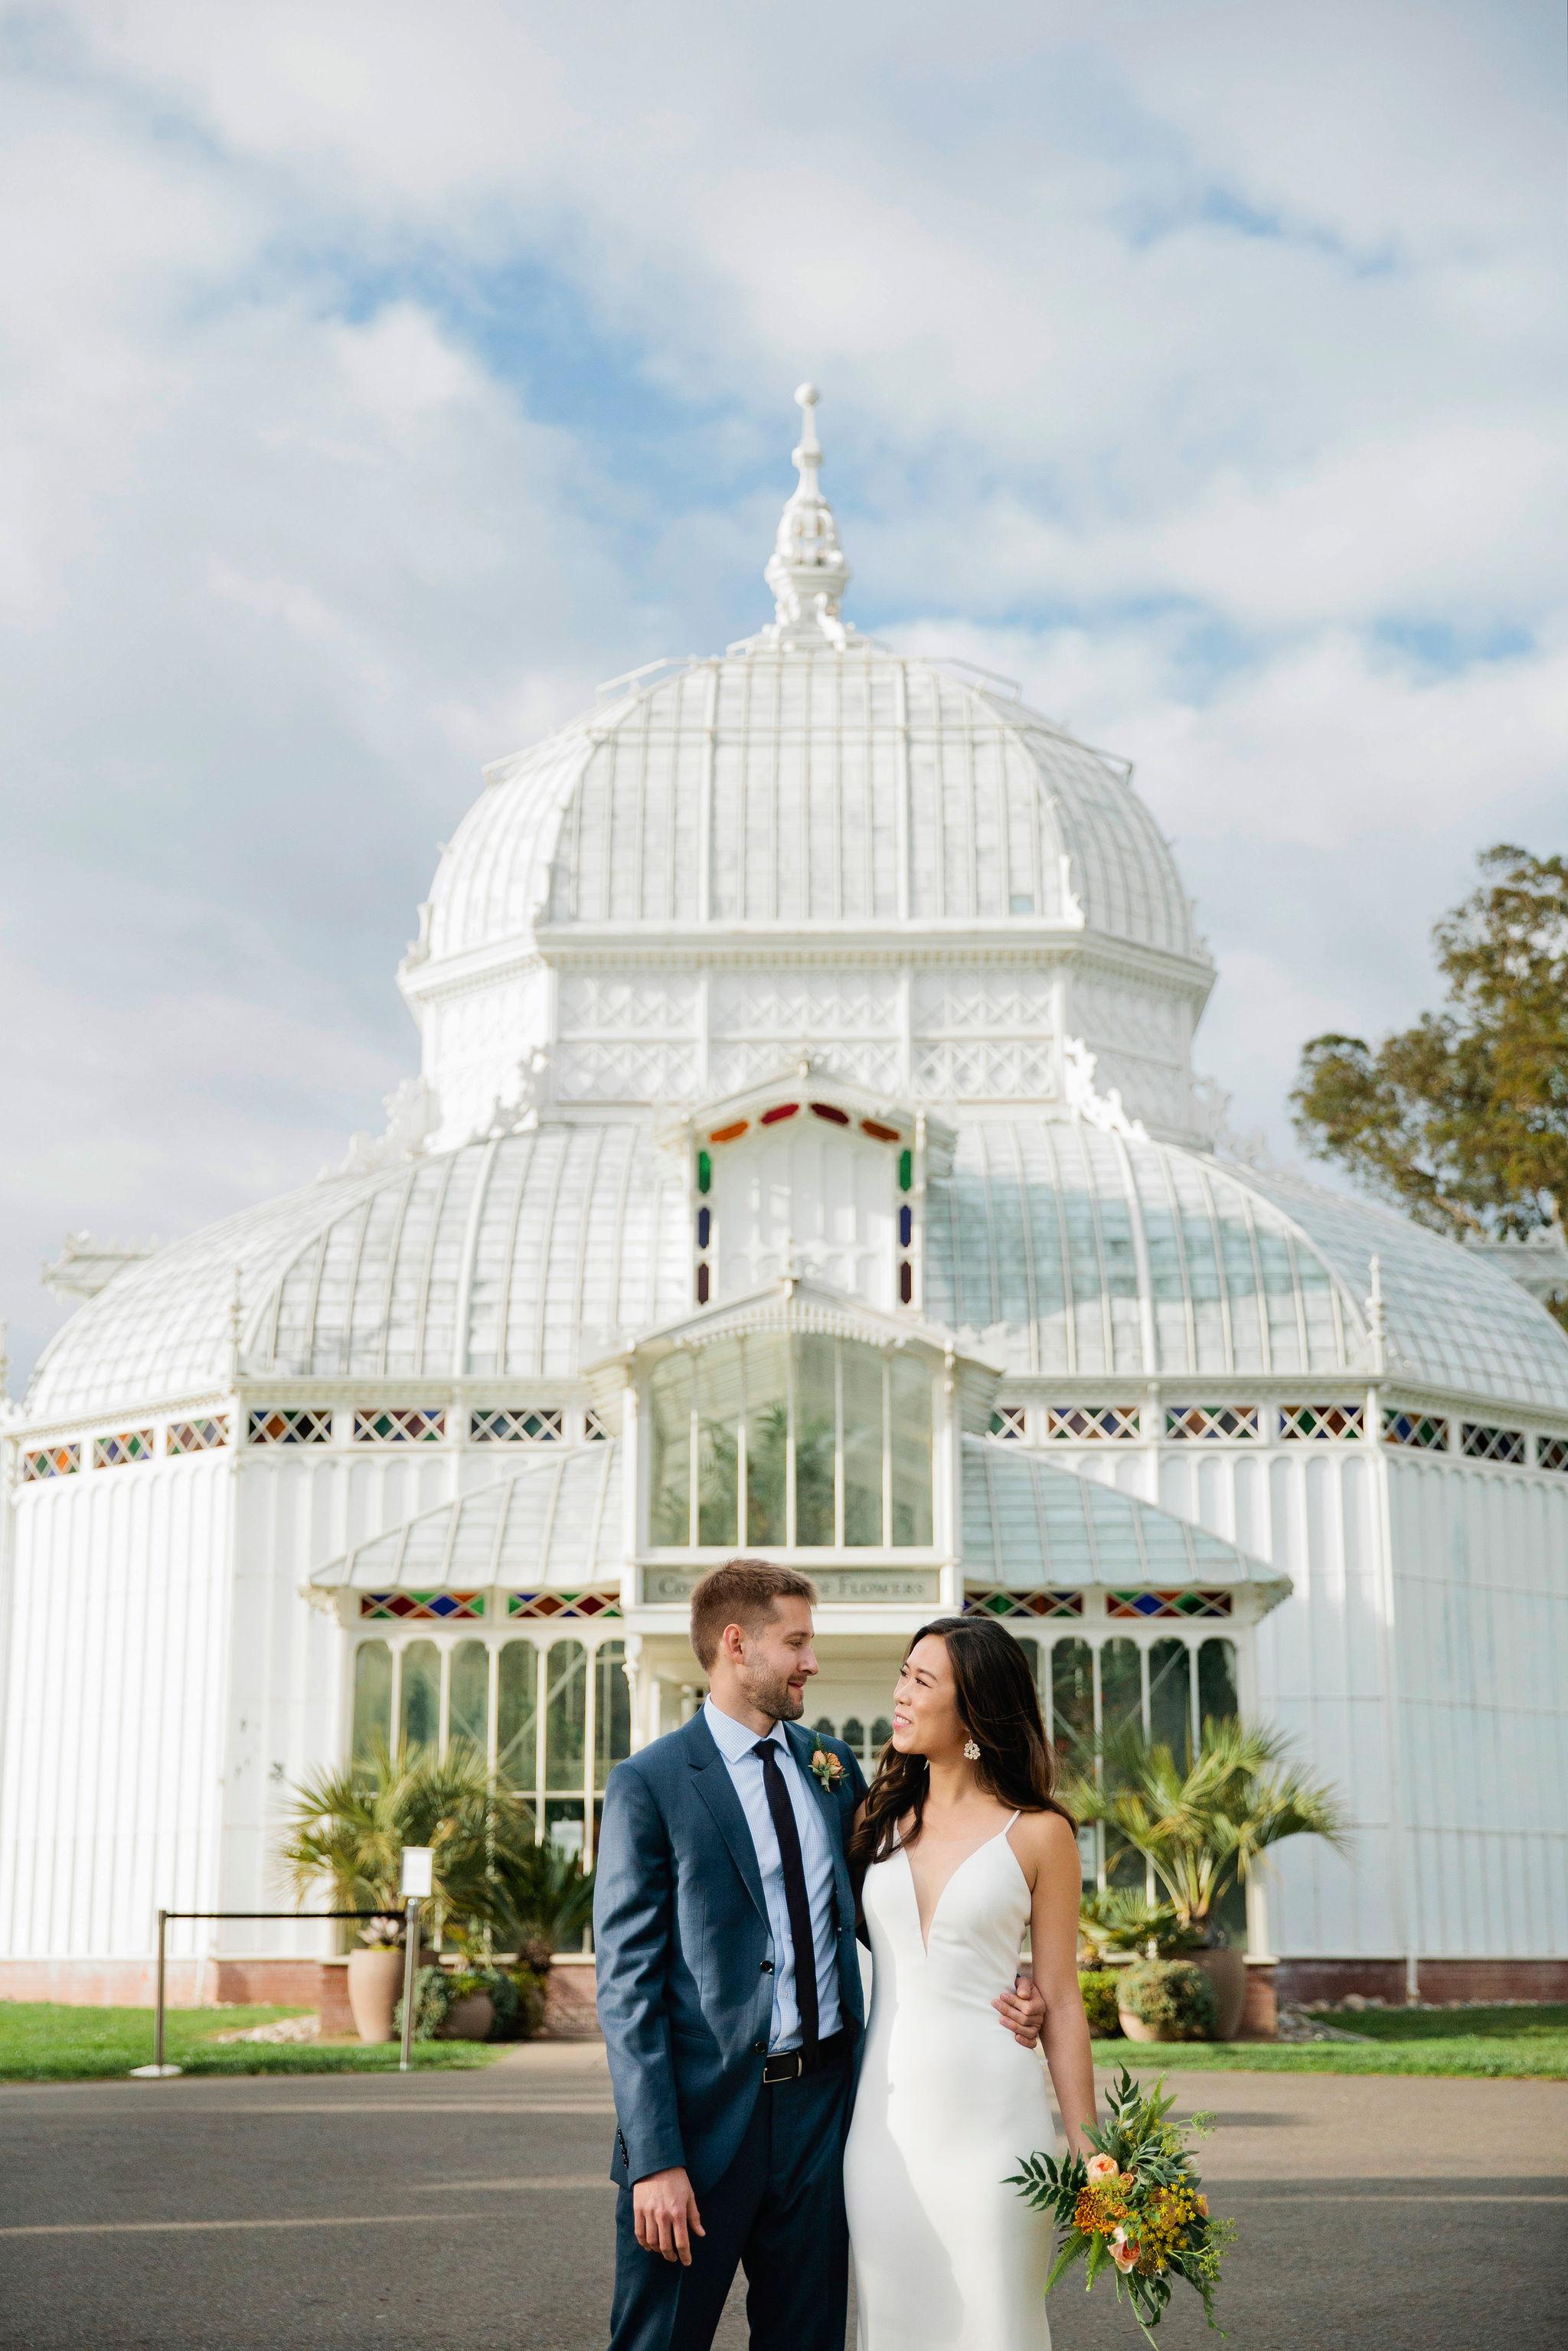 Conservatory-of-Flowers-Wedding-21.JPG